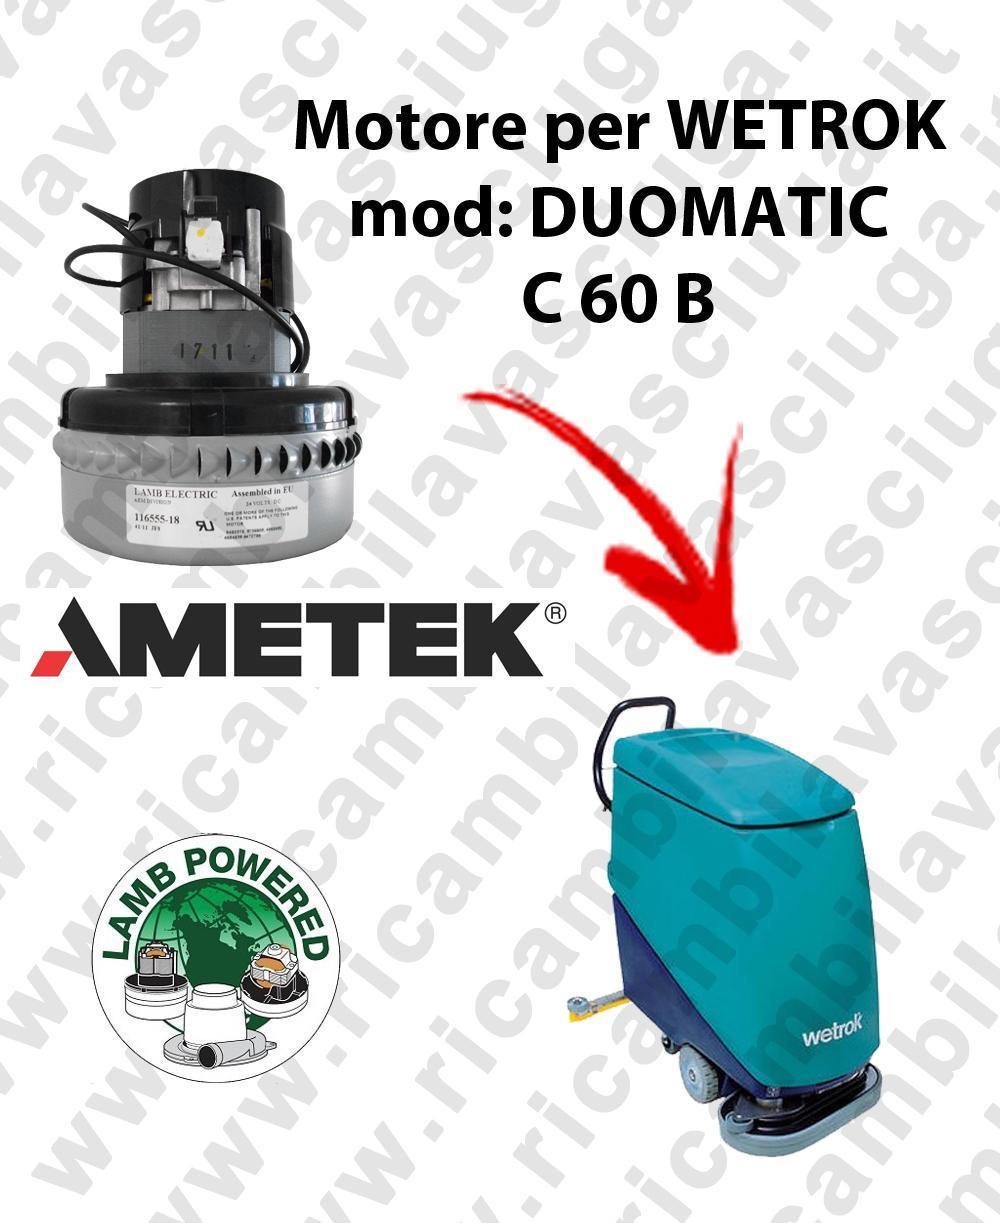 DUOMATIC C 60 B Motore de aspiración LAMB AMETEK para fregadora WETROK